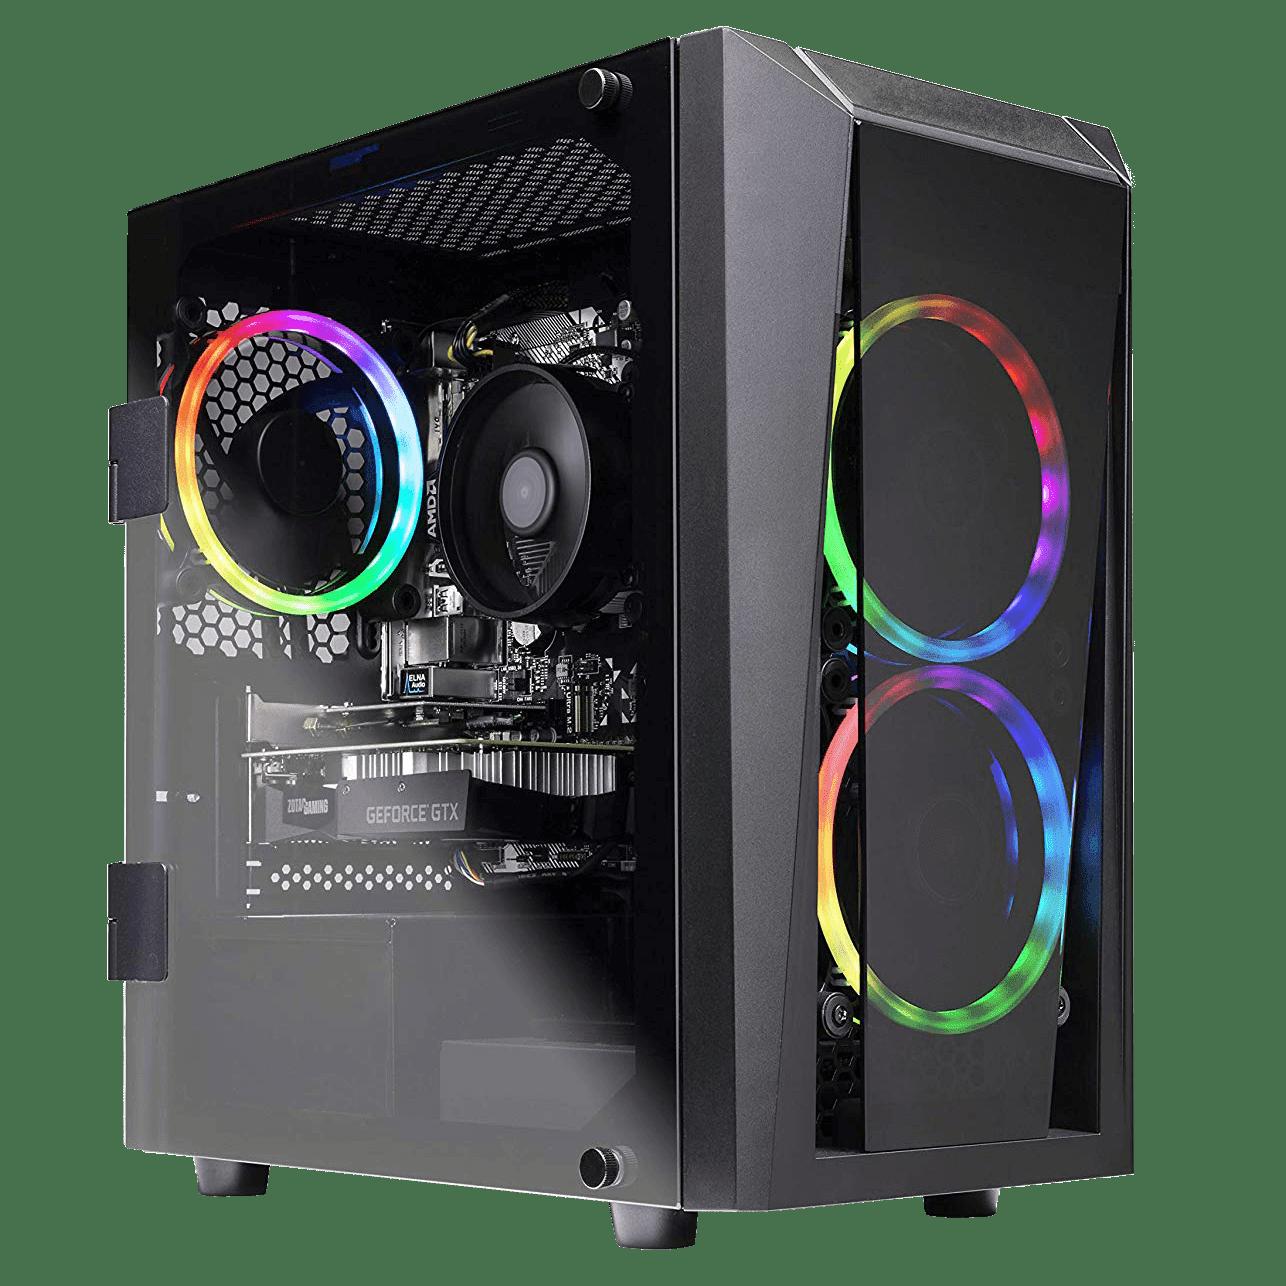 Best motherboard for ryzen 5 2600